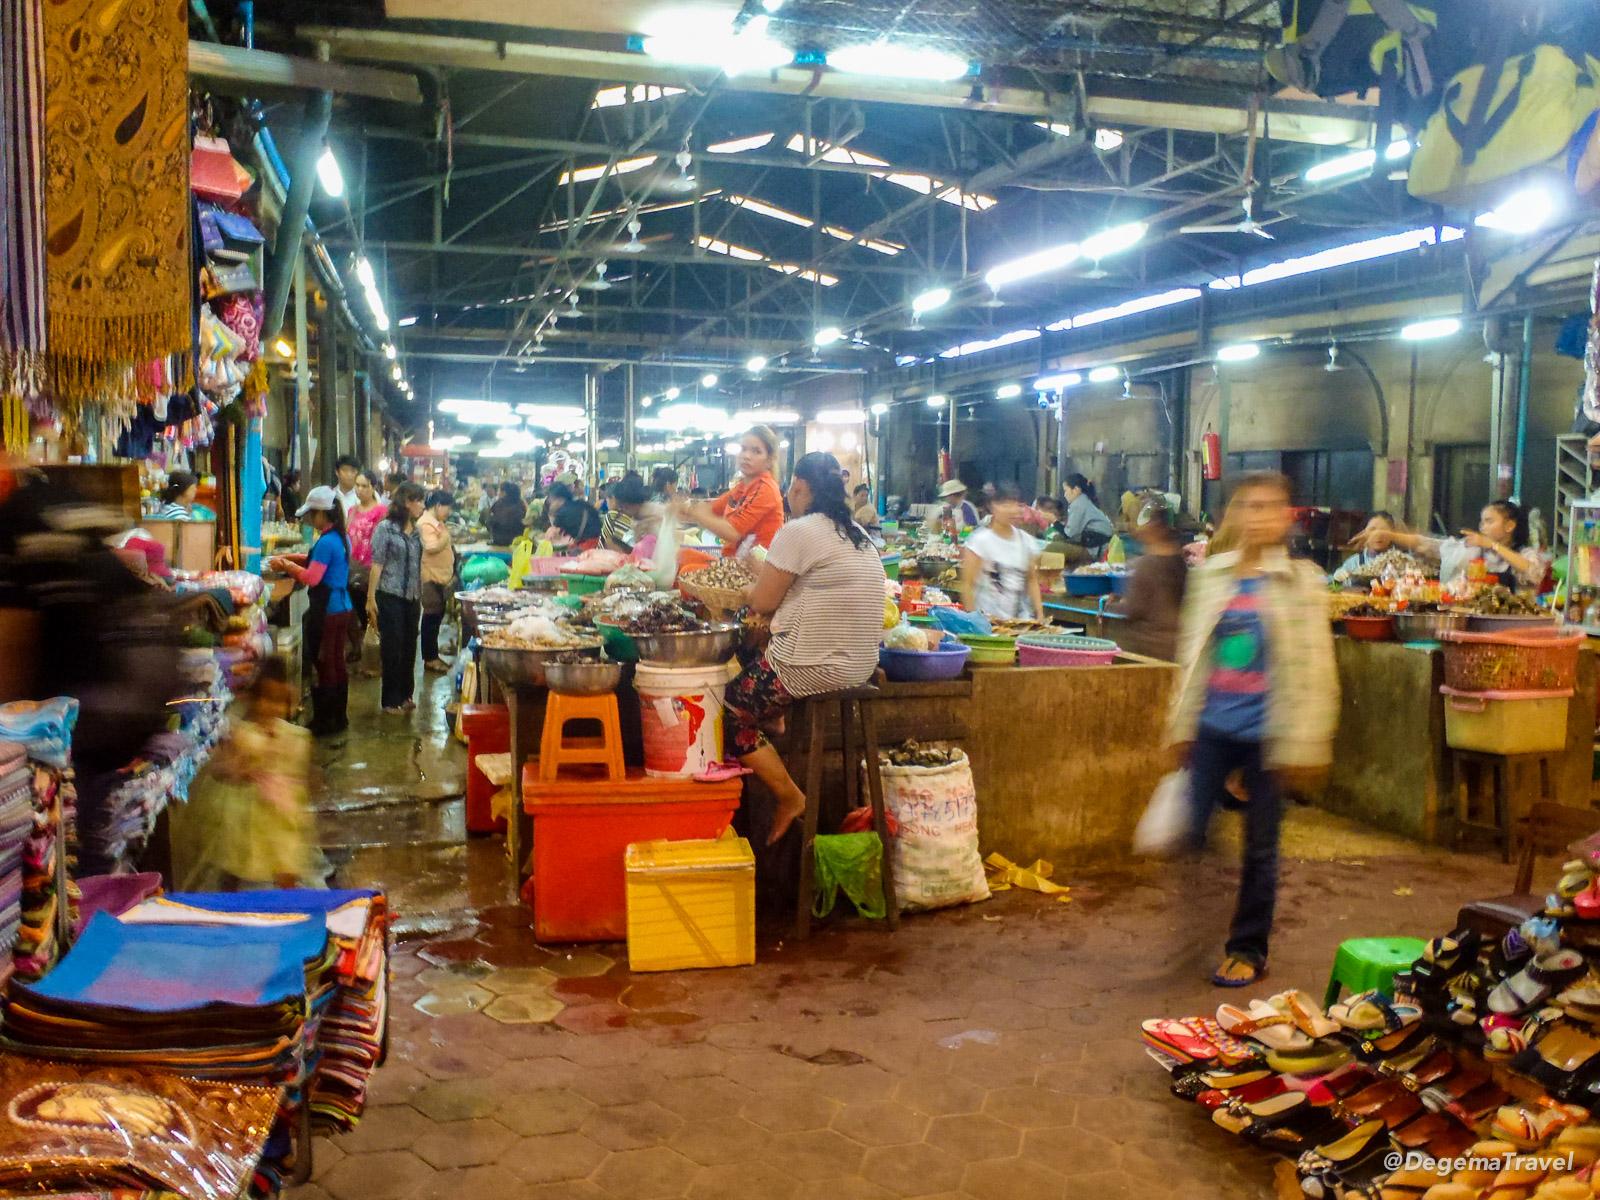 Siem Reap Old Market, Cambodia